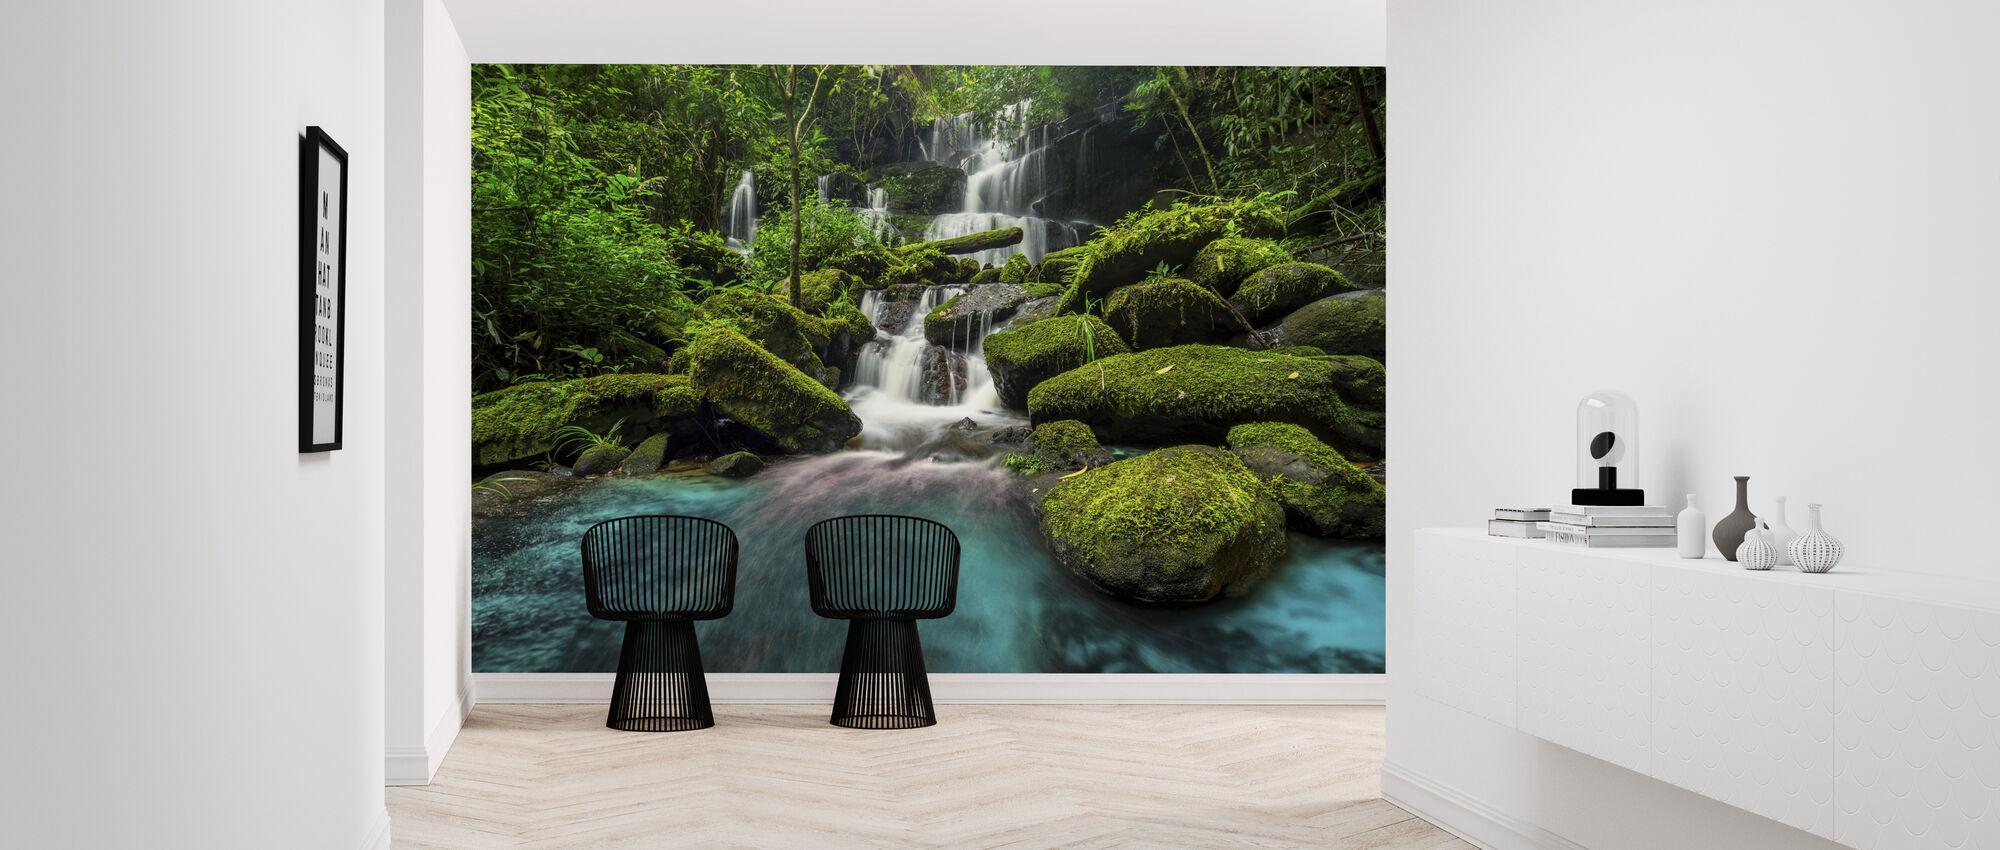 Waterfall in Green Forest - Wallpaper - Hallway